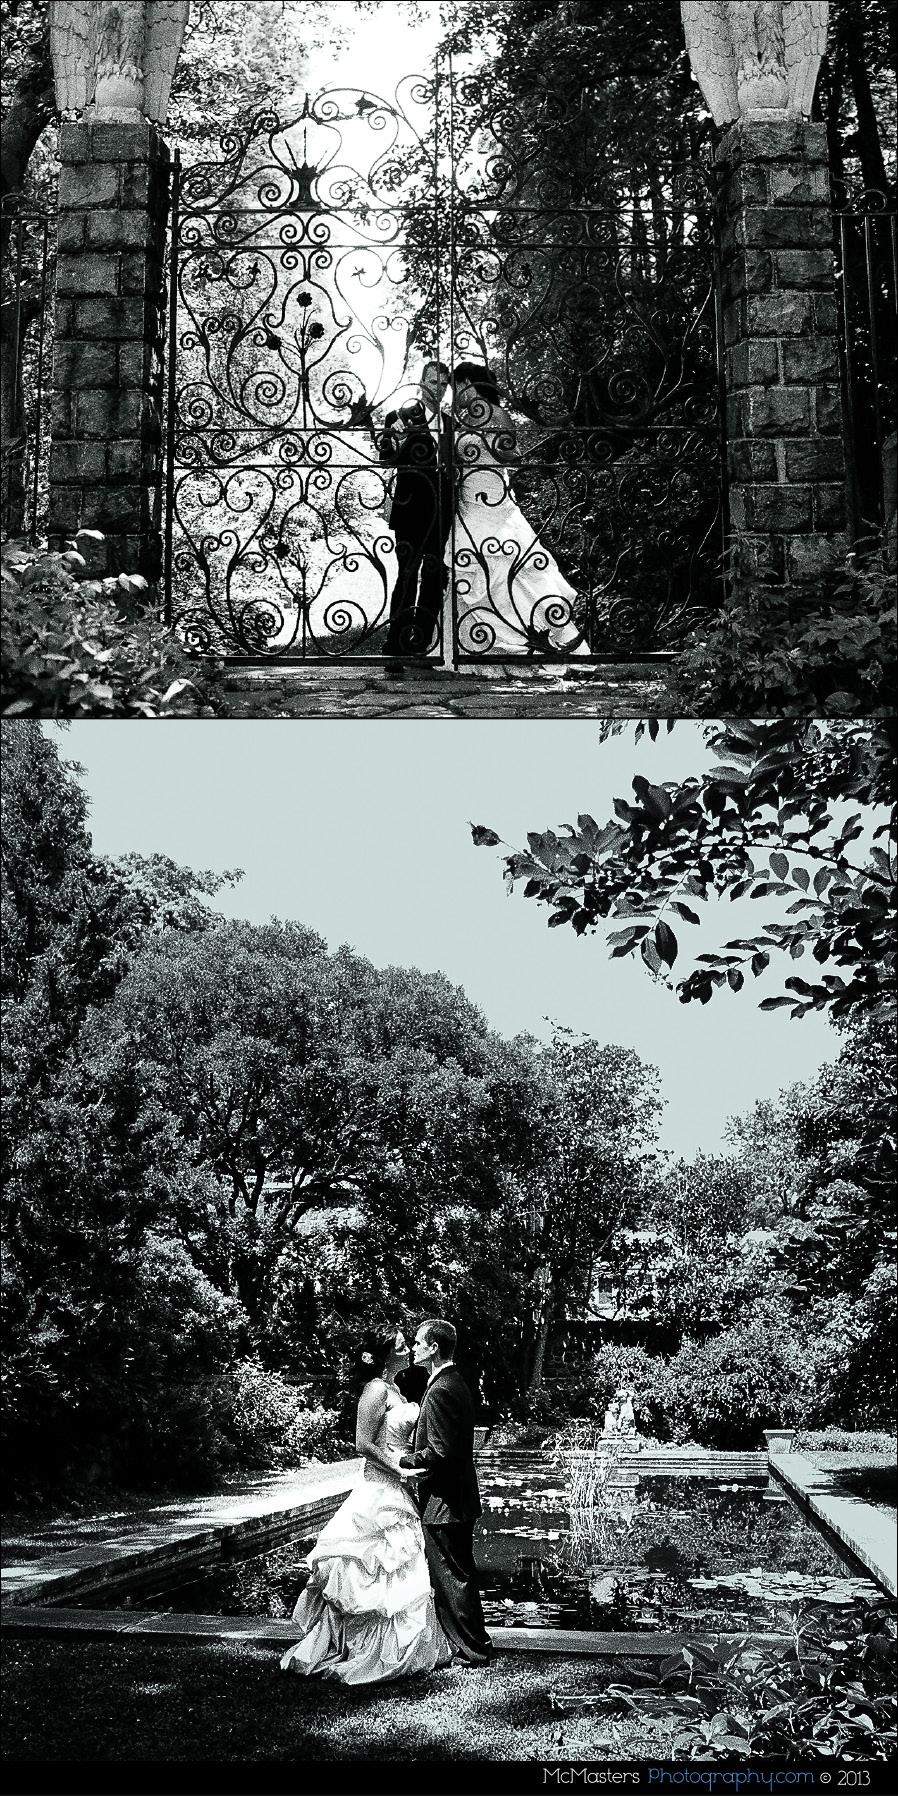 Philadelphia-35mm-film-photographers